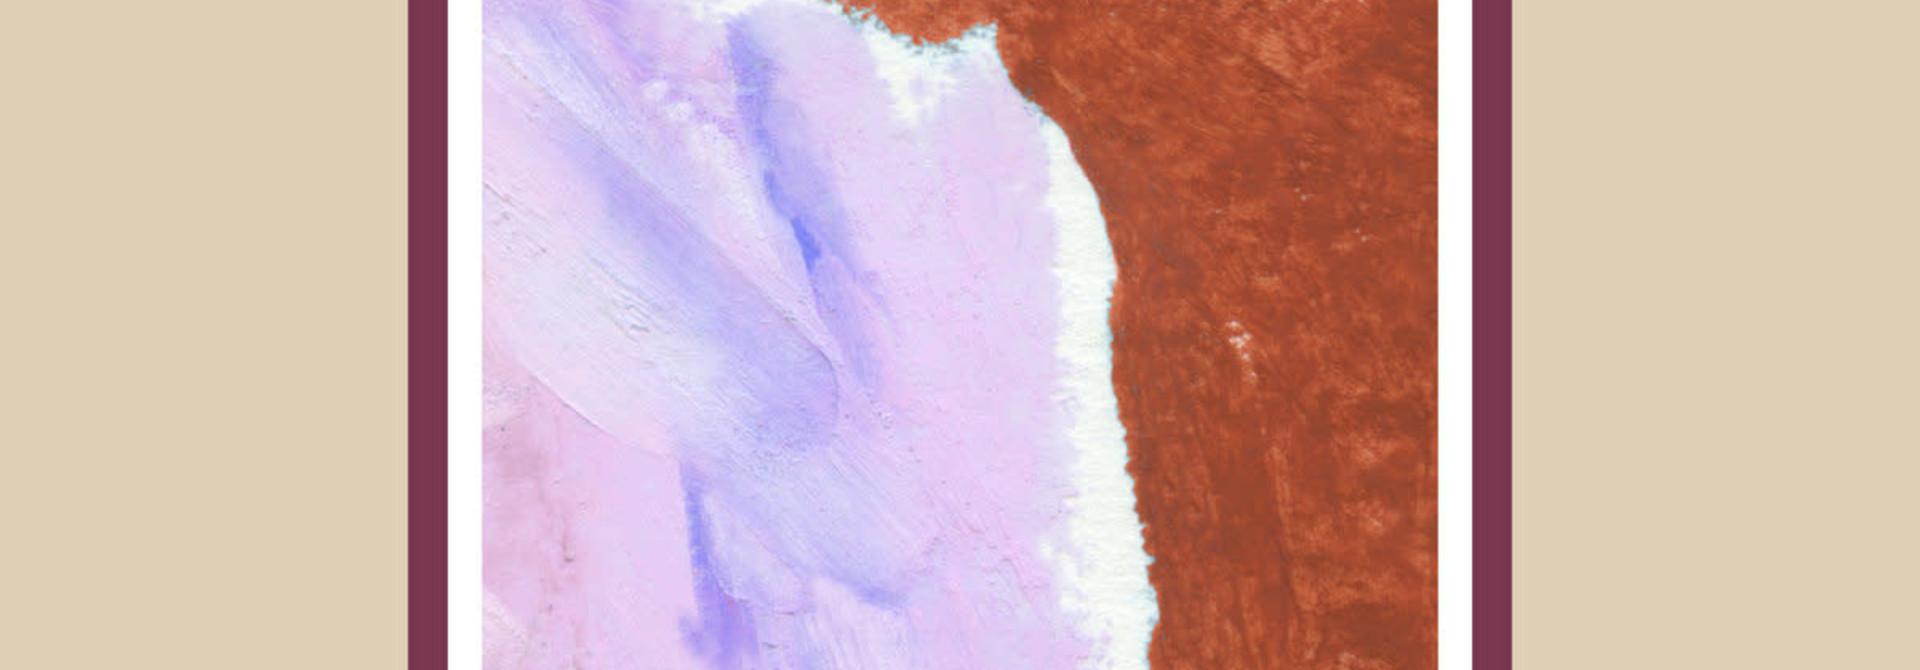 Helena Deland • Altogether Unaccompanied Vol. III & IV